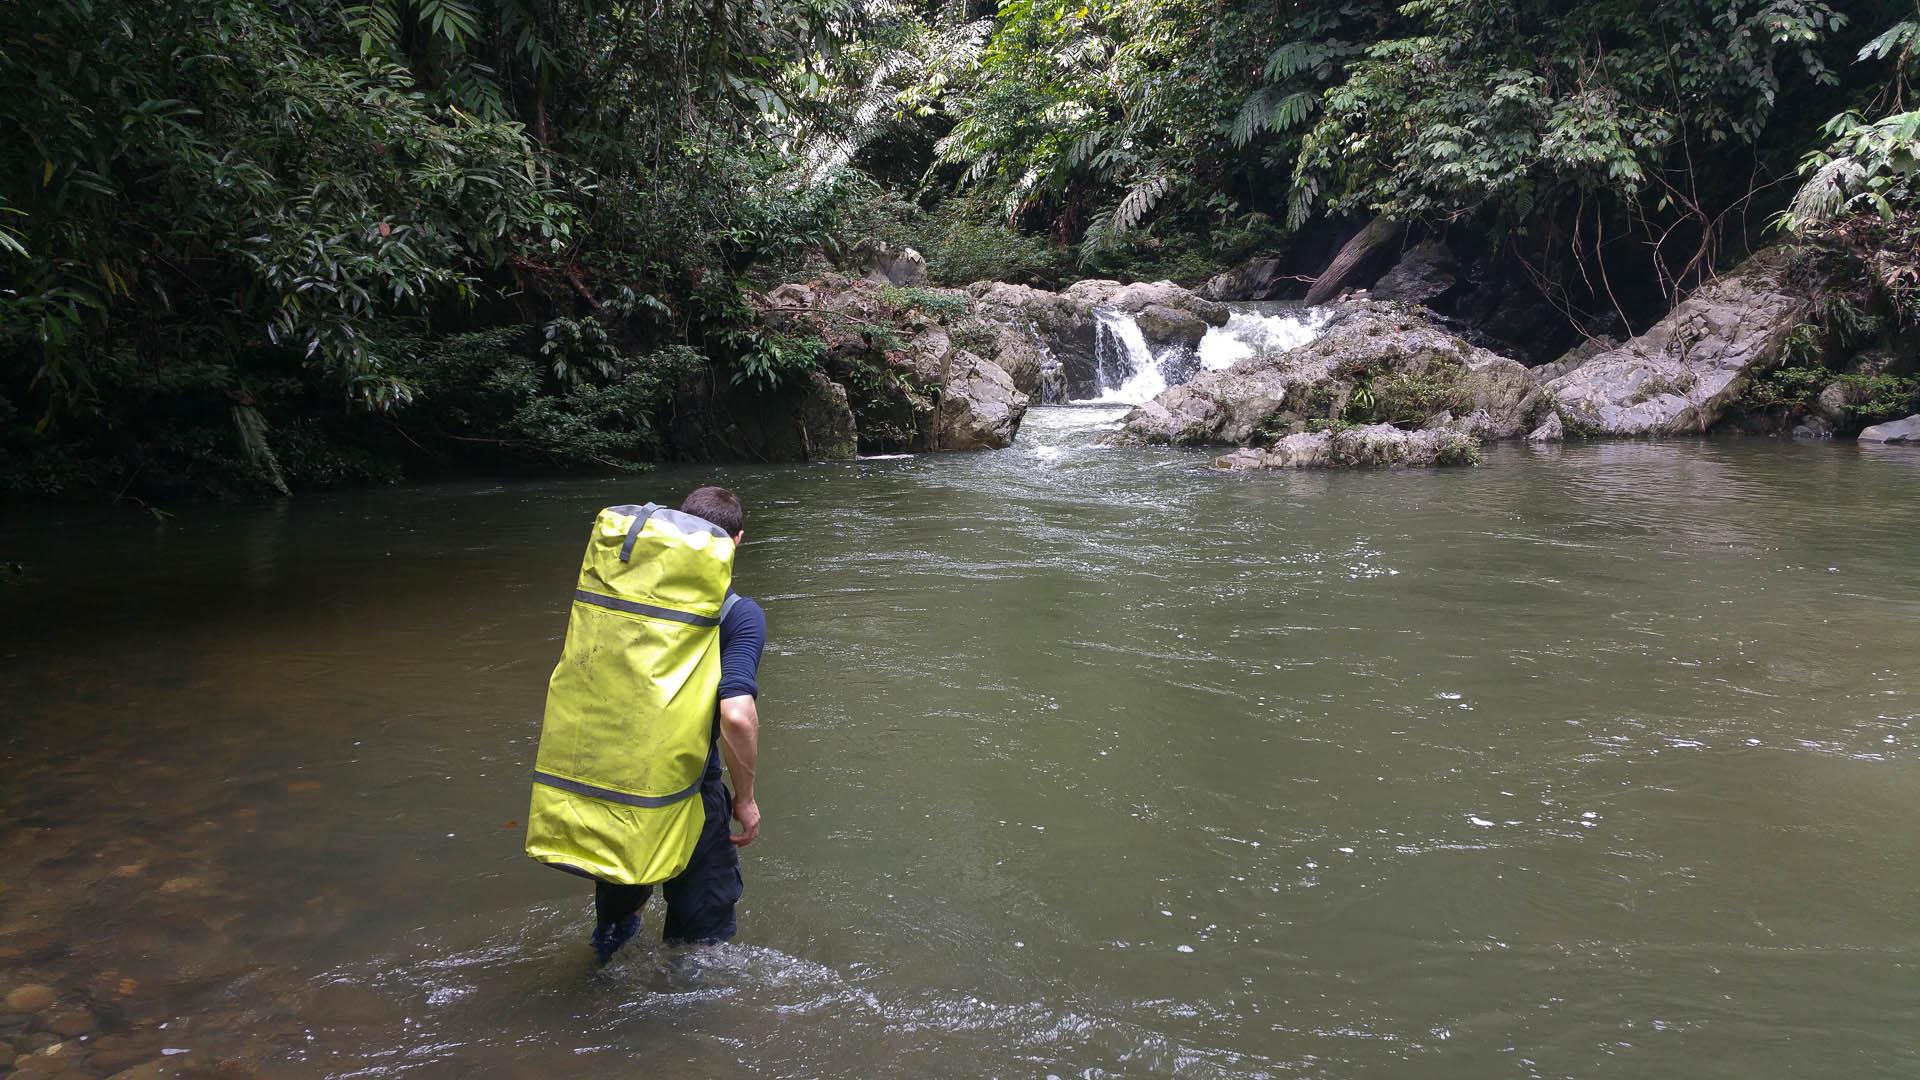 Martin Holland Borneo Explorer and Conservationist